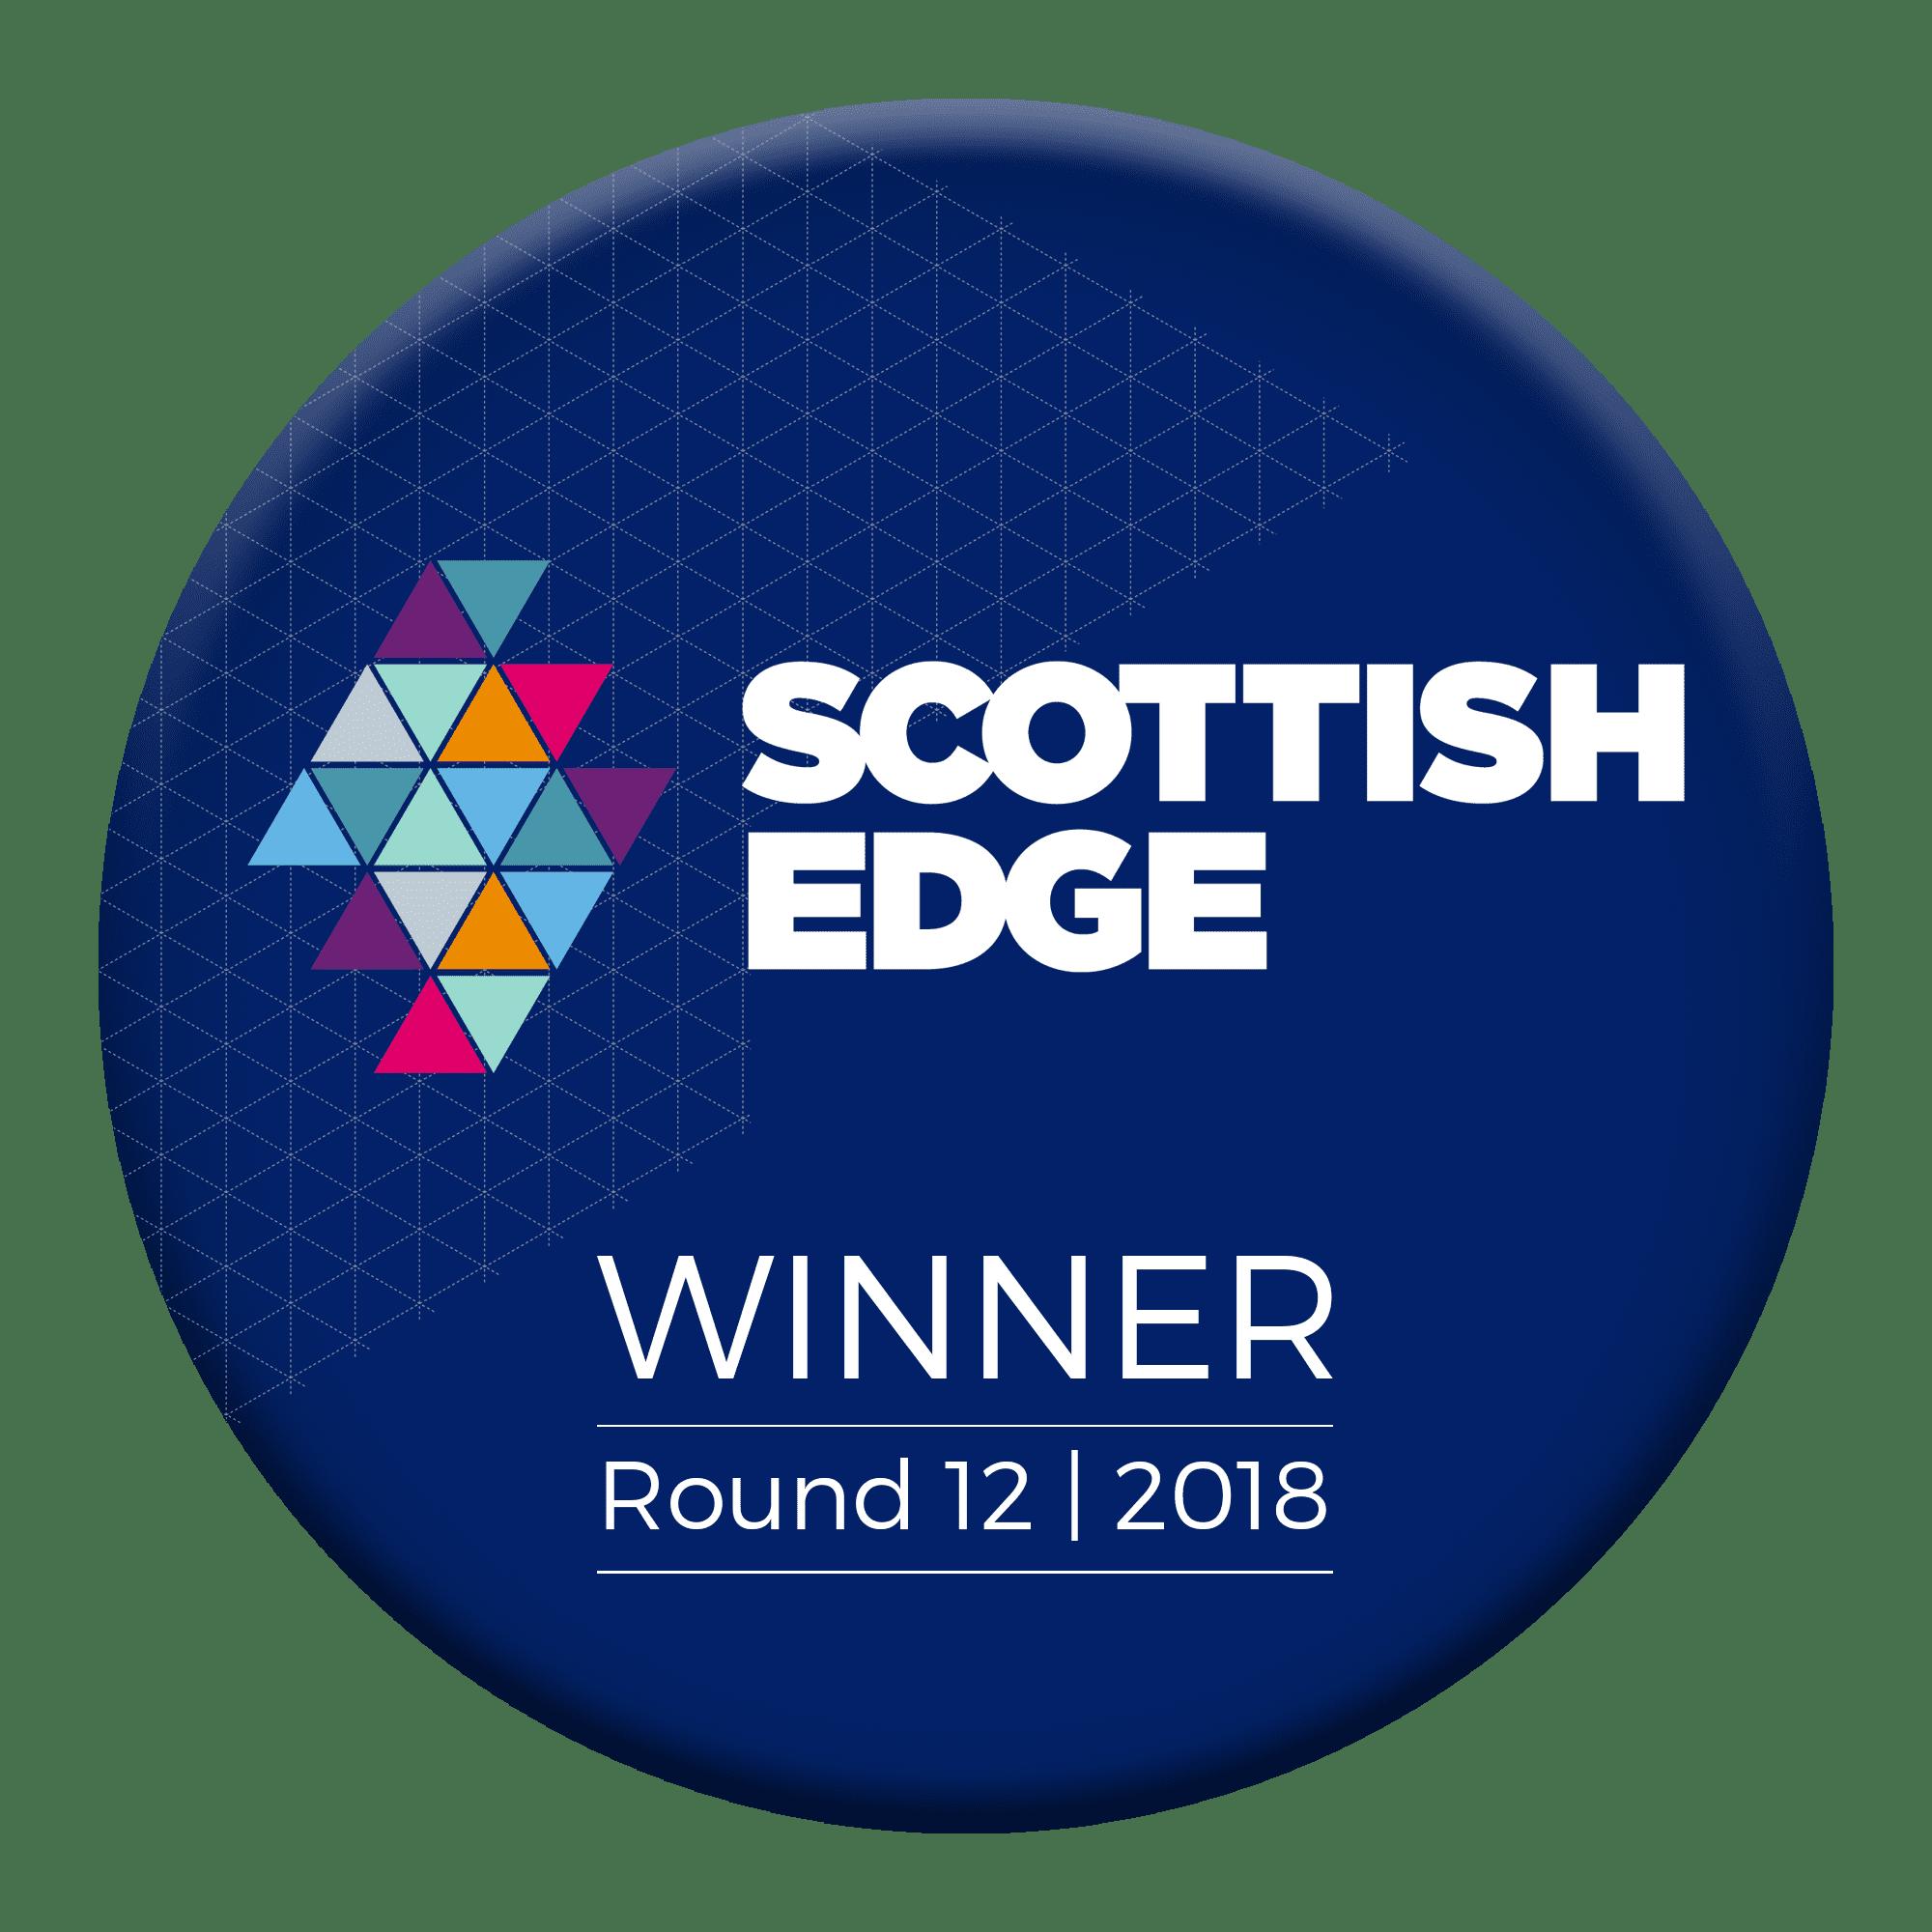 scottish-edge-winner-badge